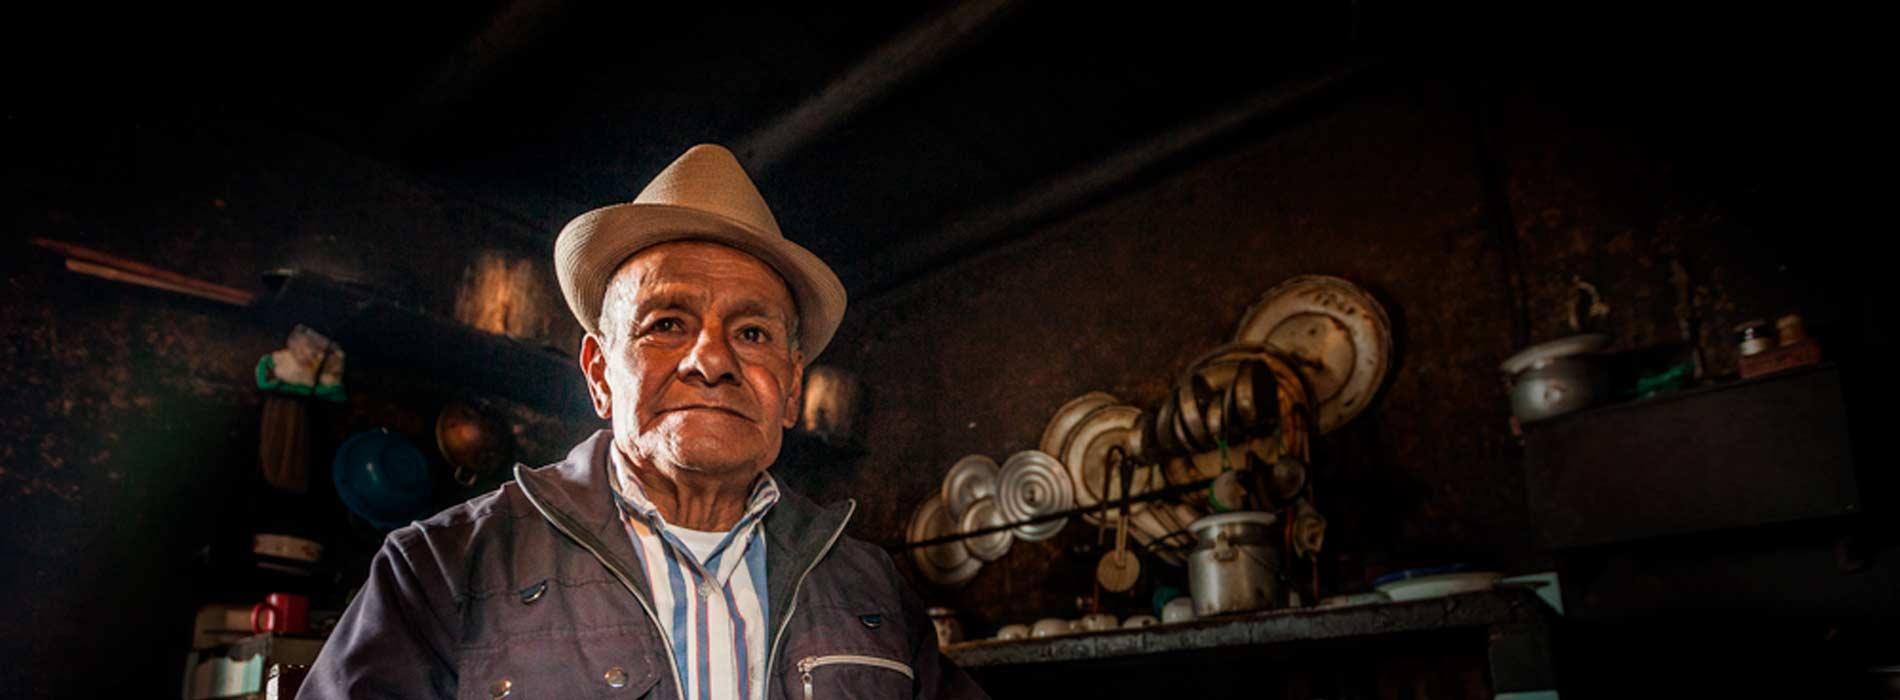 Personaje de la serie documental Ancestral Colombia.